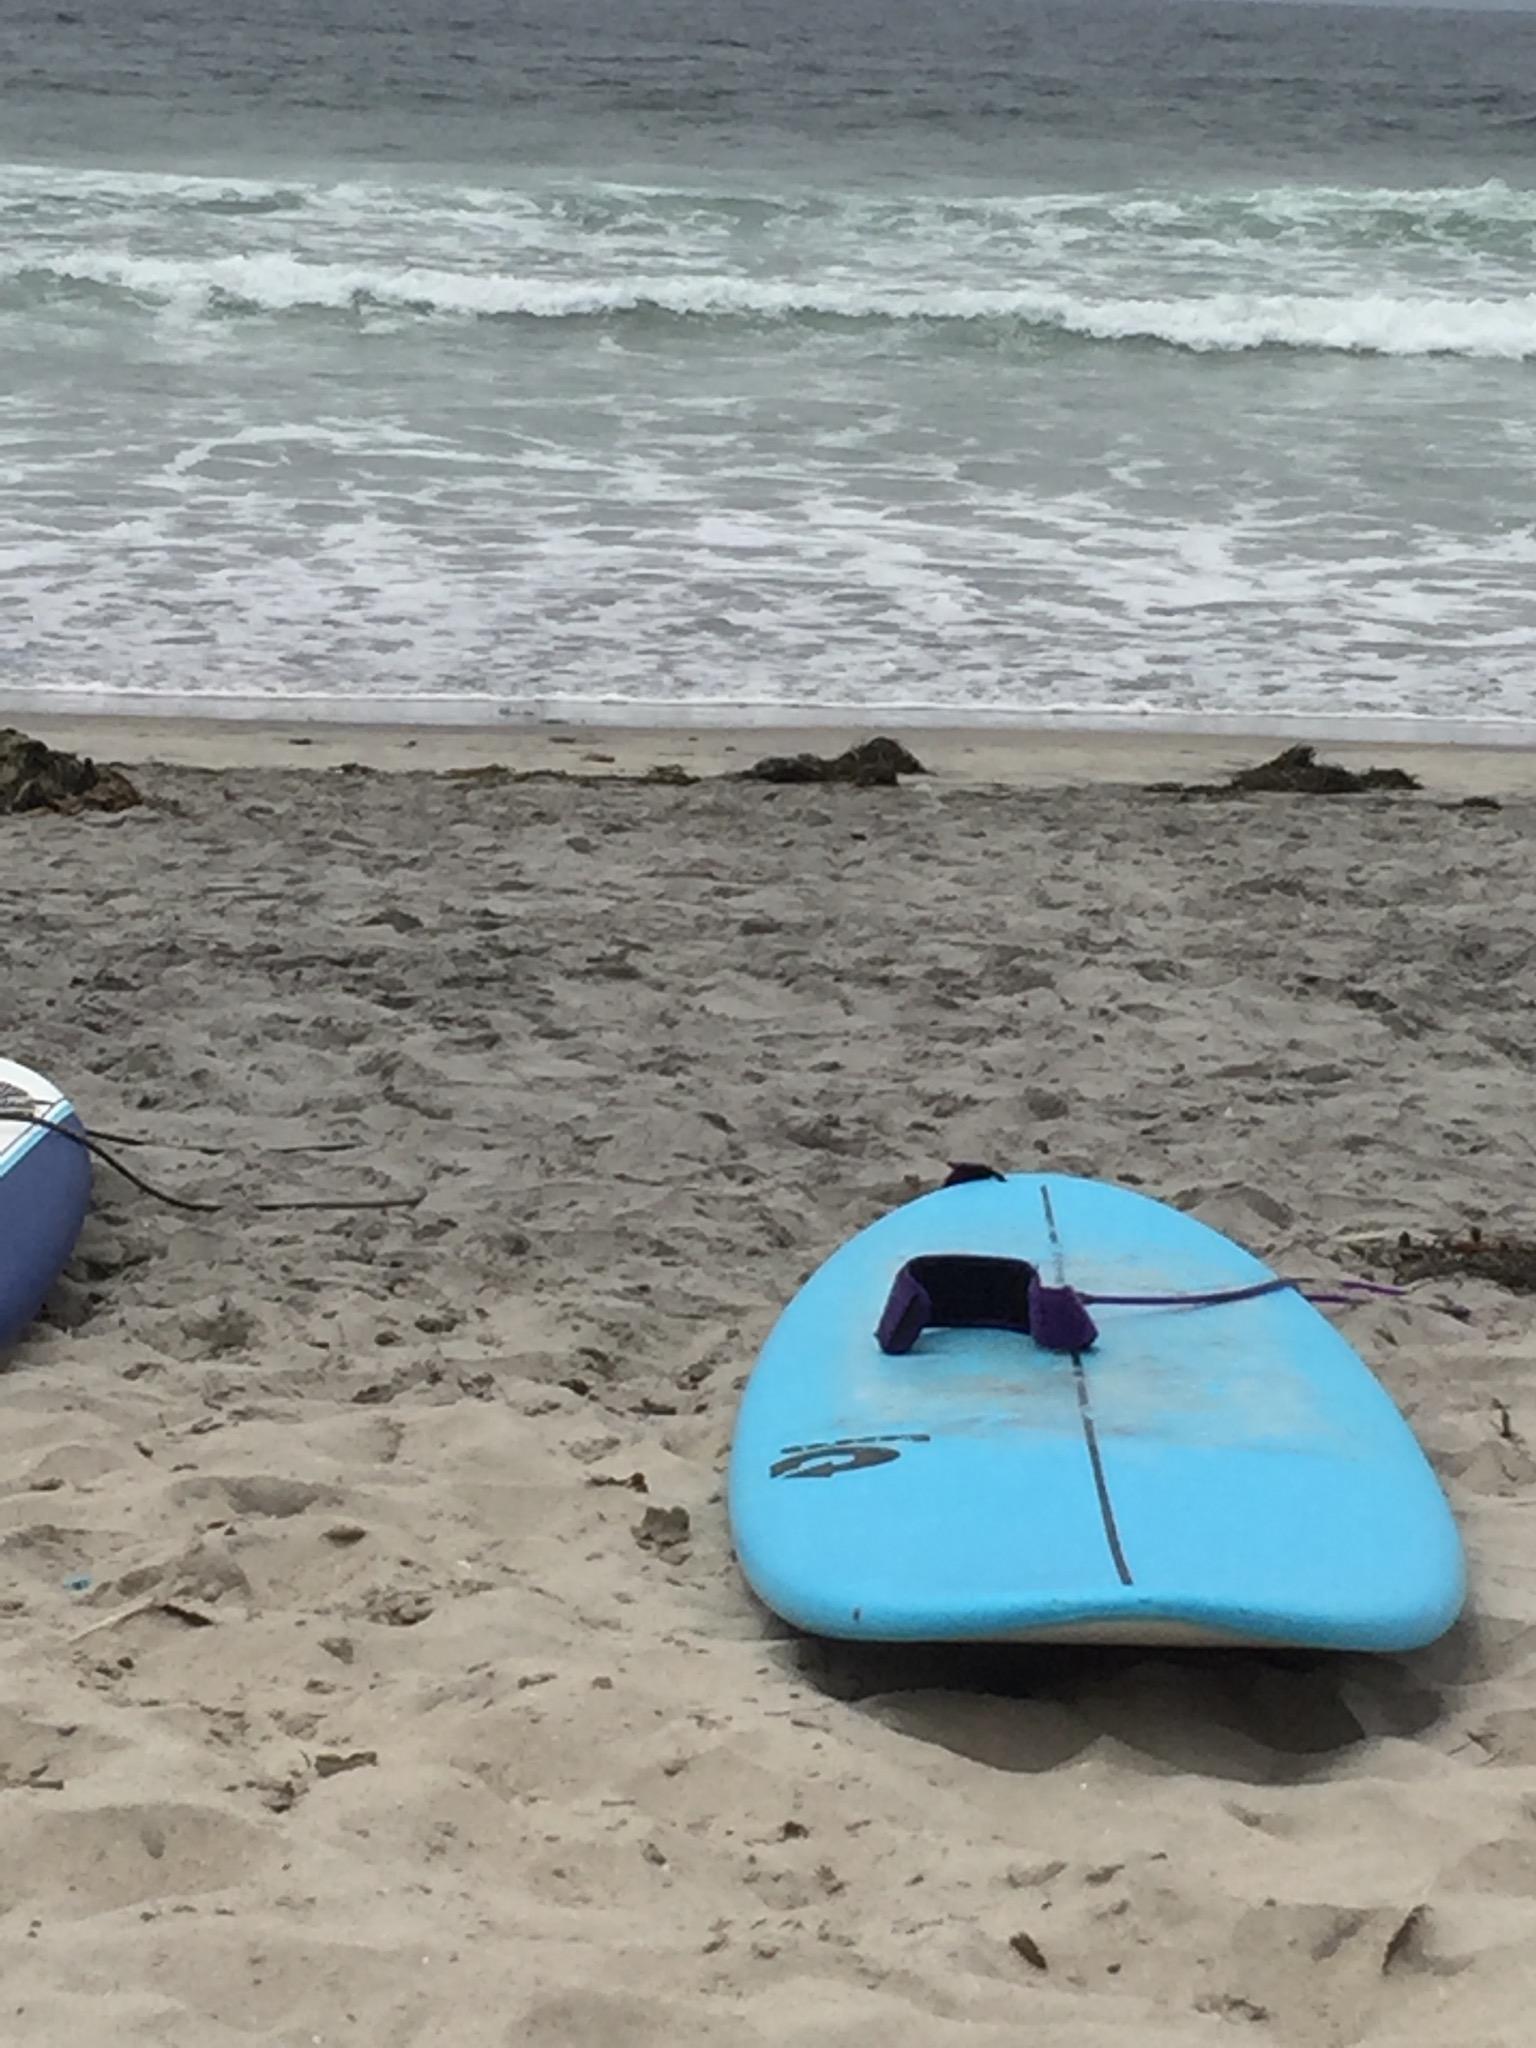 Del Mar Beach, California